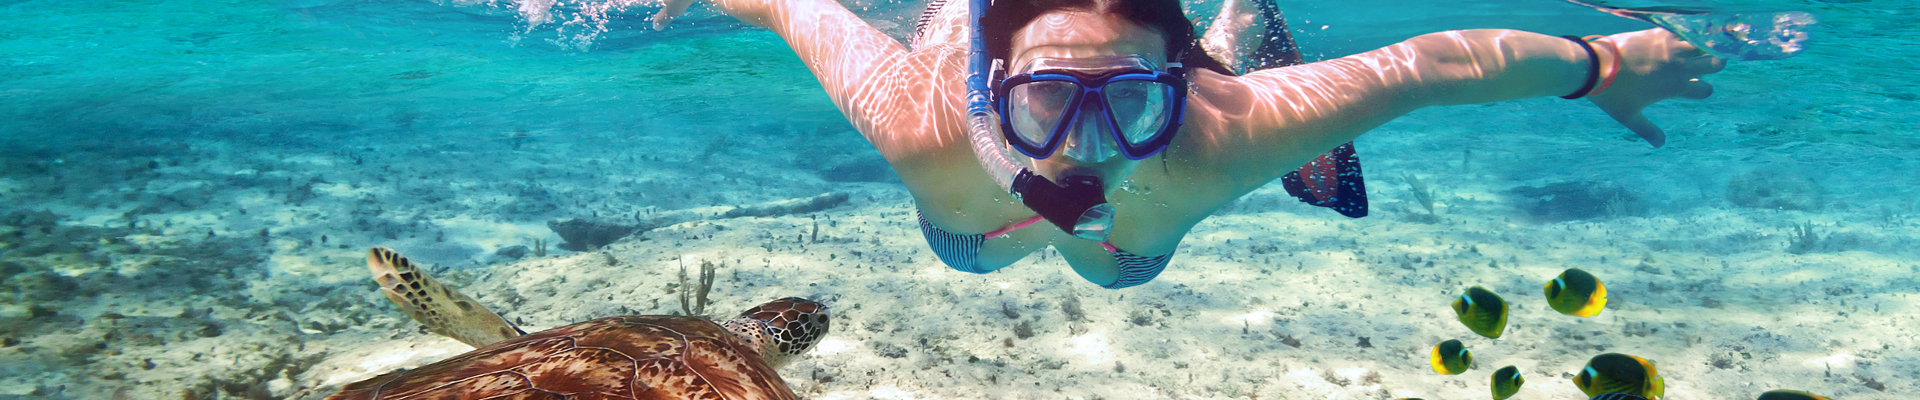 bigstock-Beautiful-women-snorkeling-in--121025945x